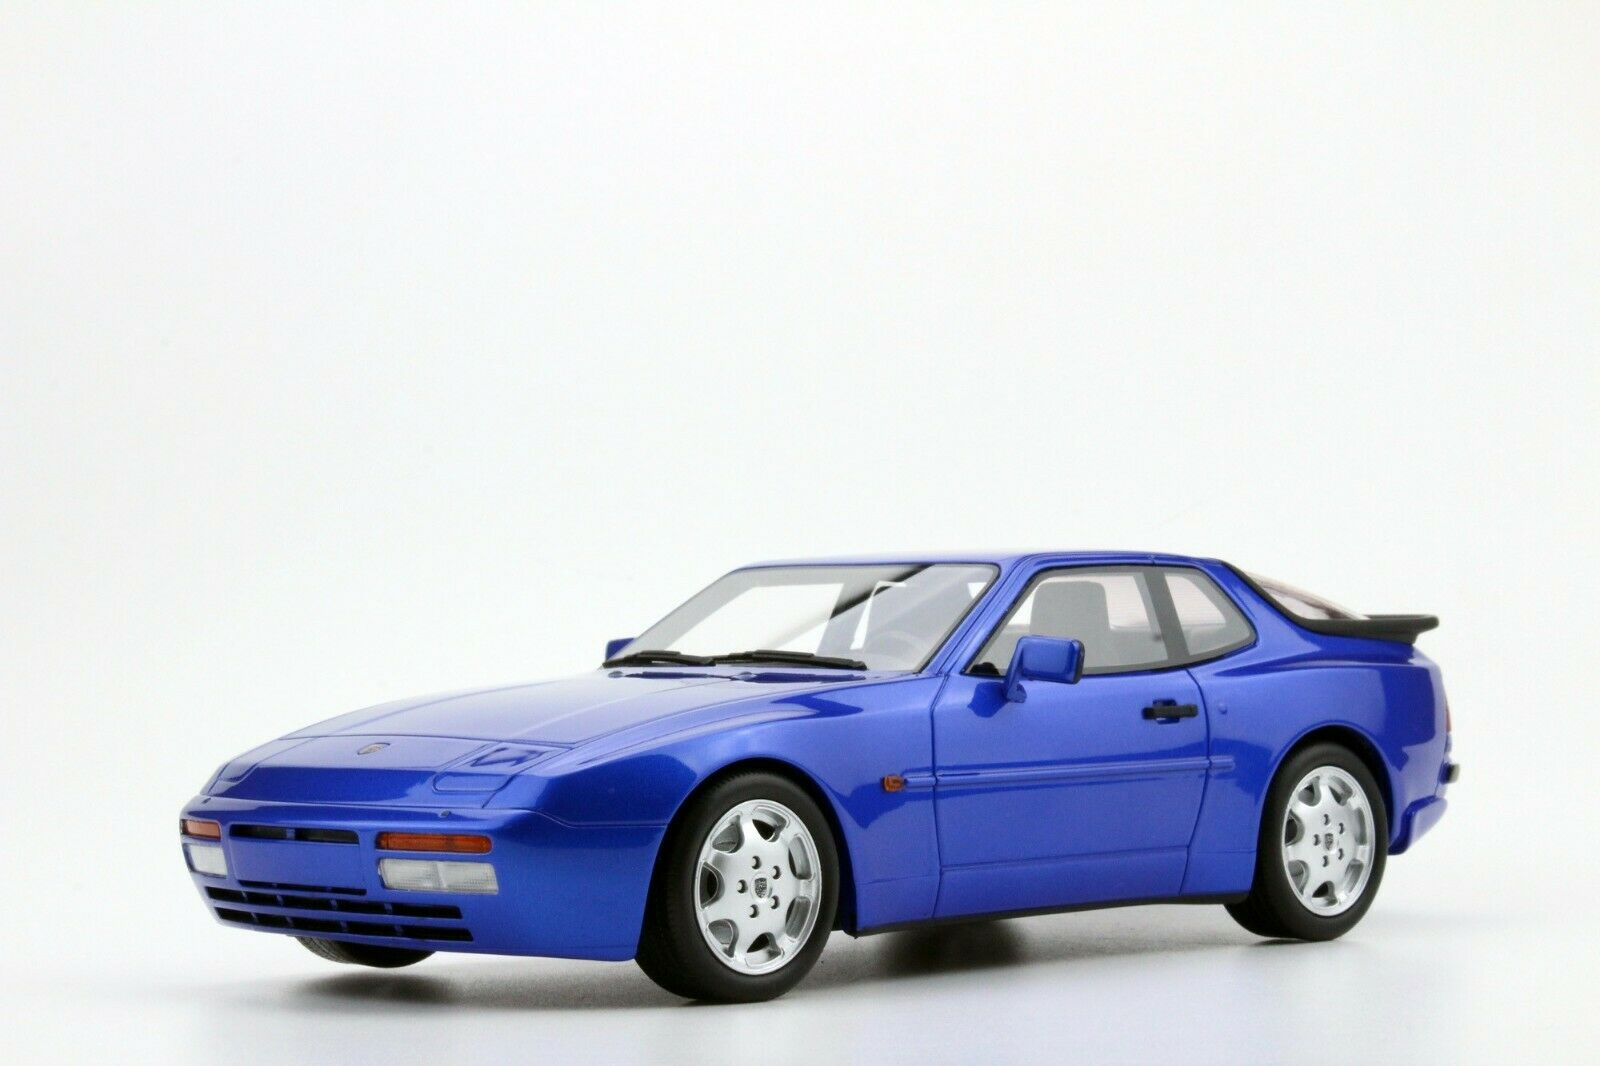 PORSCHE 944 TURBO S 1991 bleu METAL LS-COLLECTIBLES LS023F 1 18 RESINE 100 PIECE